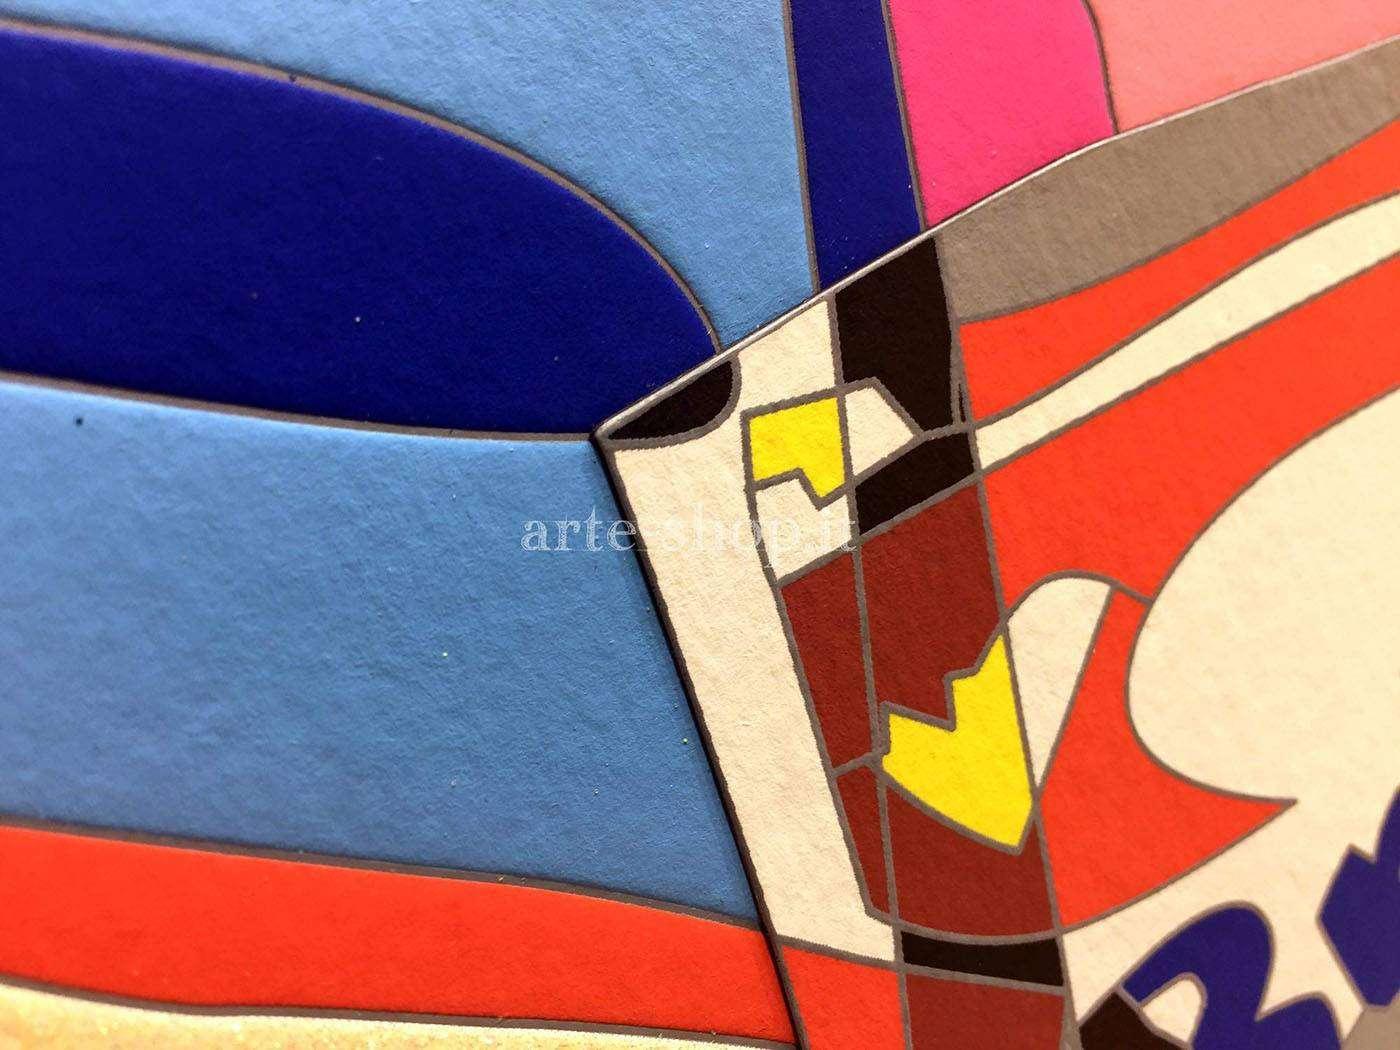 arte pentagono shop dettaglio numero 254